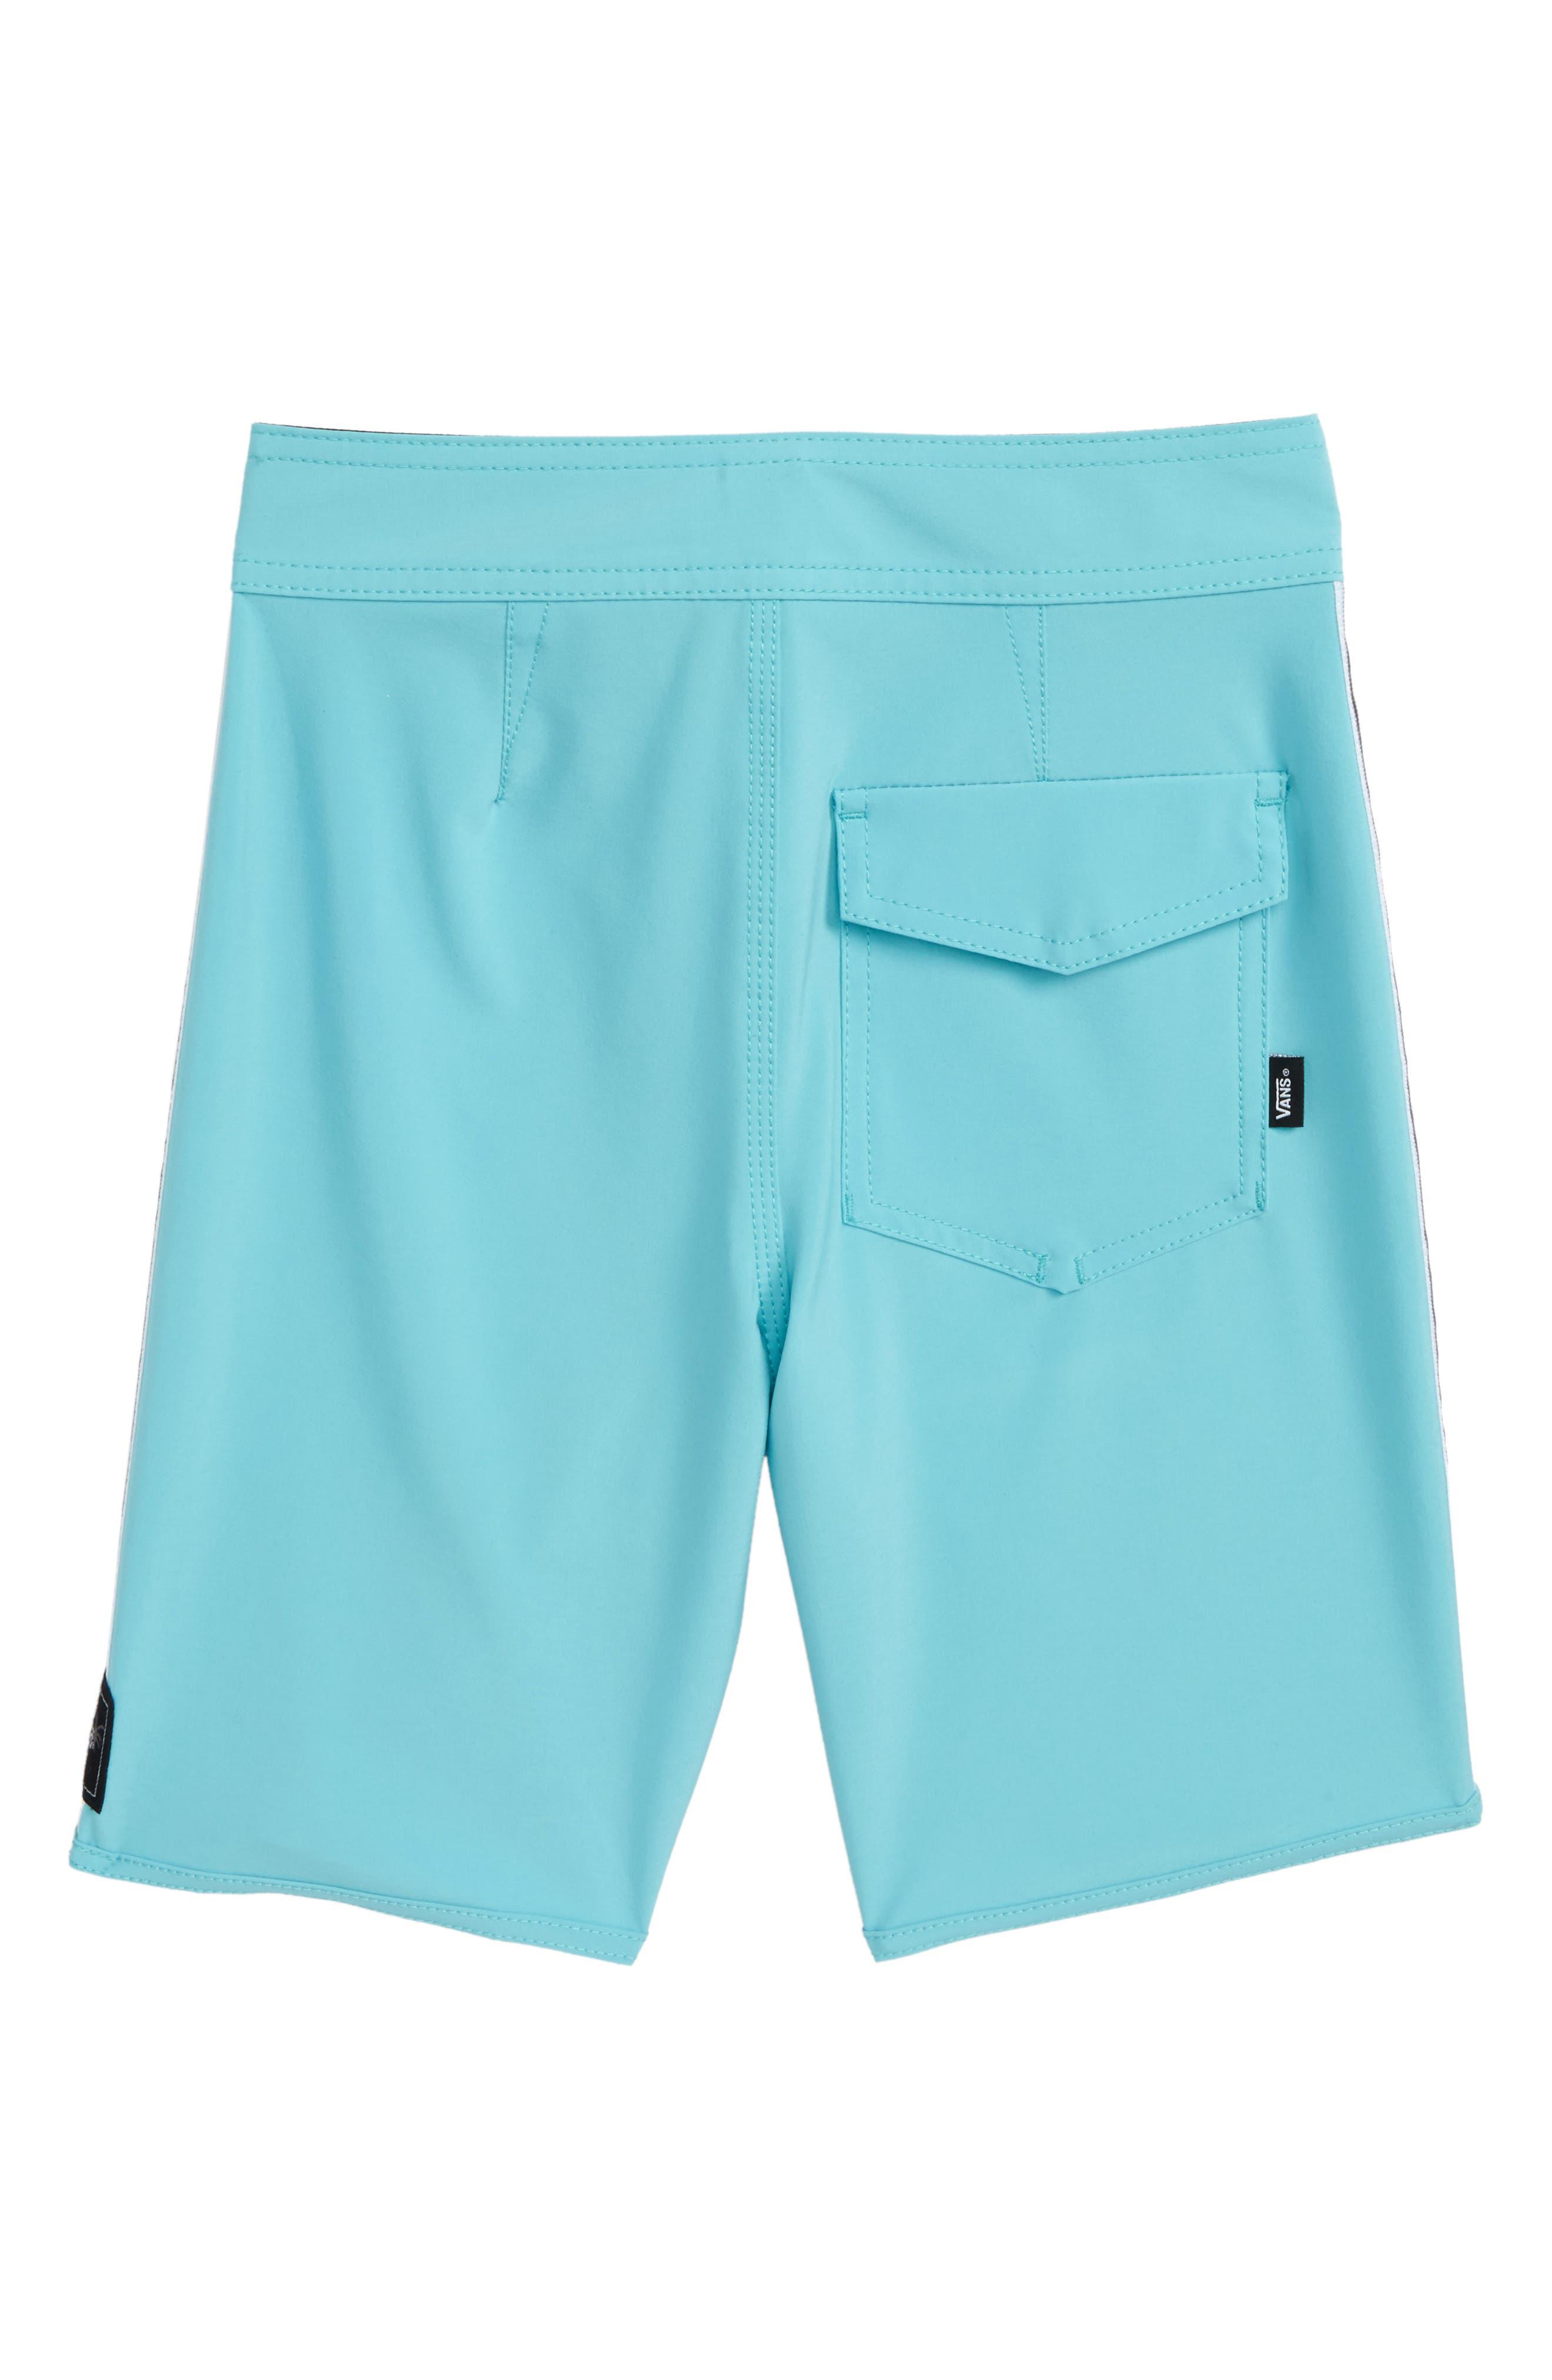 Sidestripe Board Shorts,                             Alternate thumbnail 2, color,                             Aquarelle